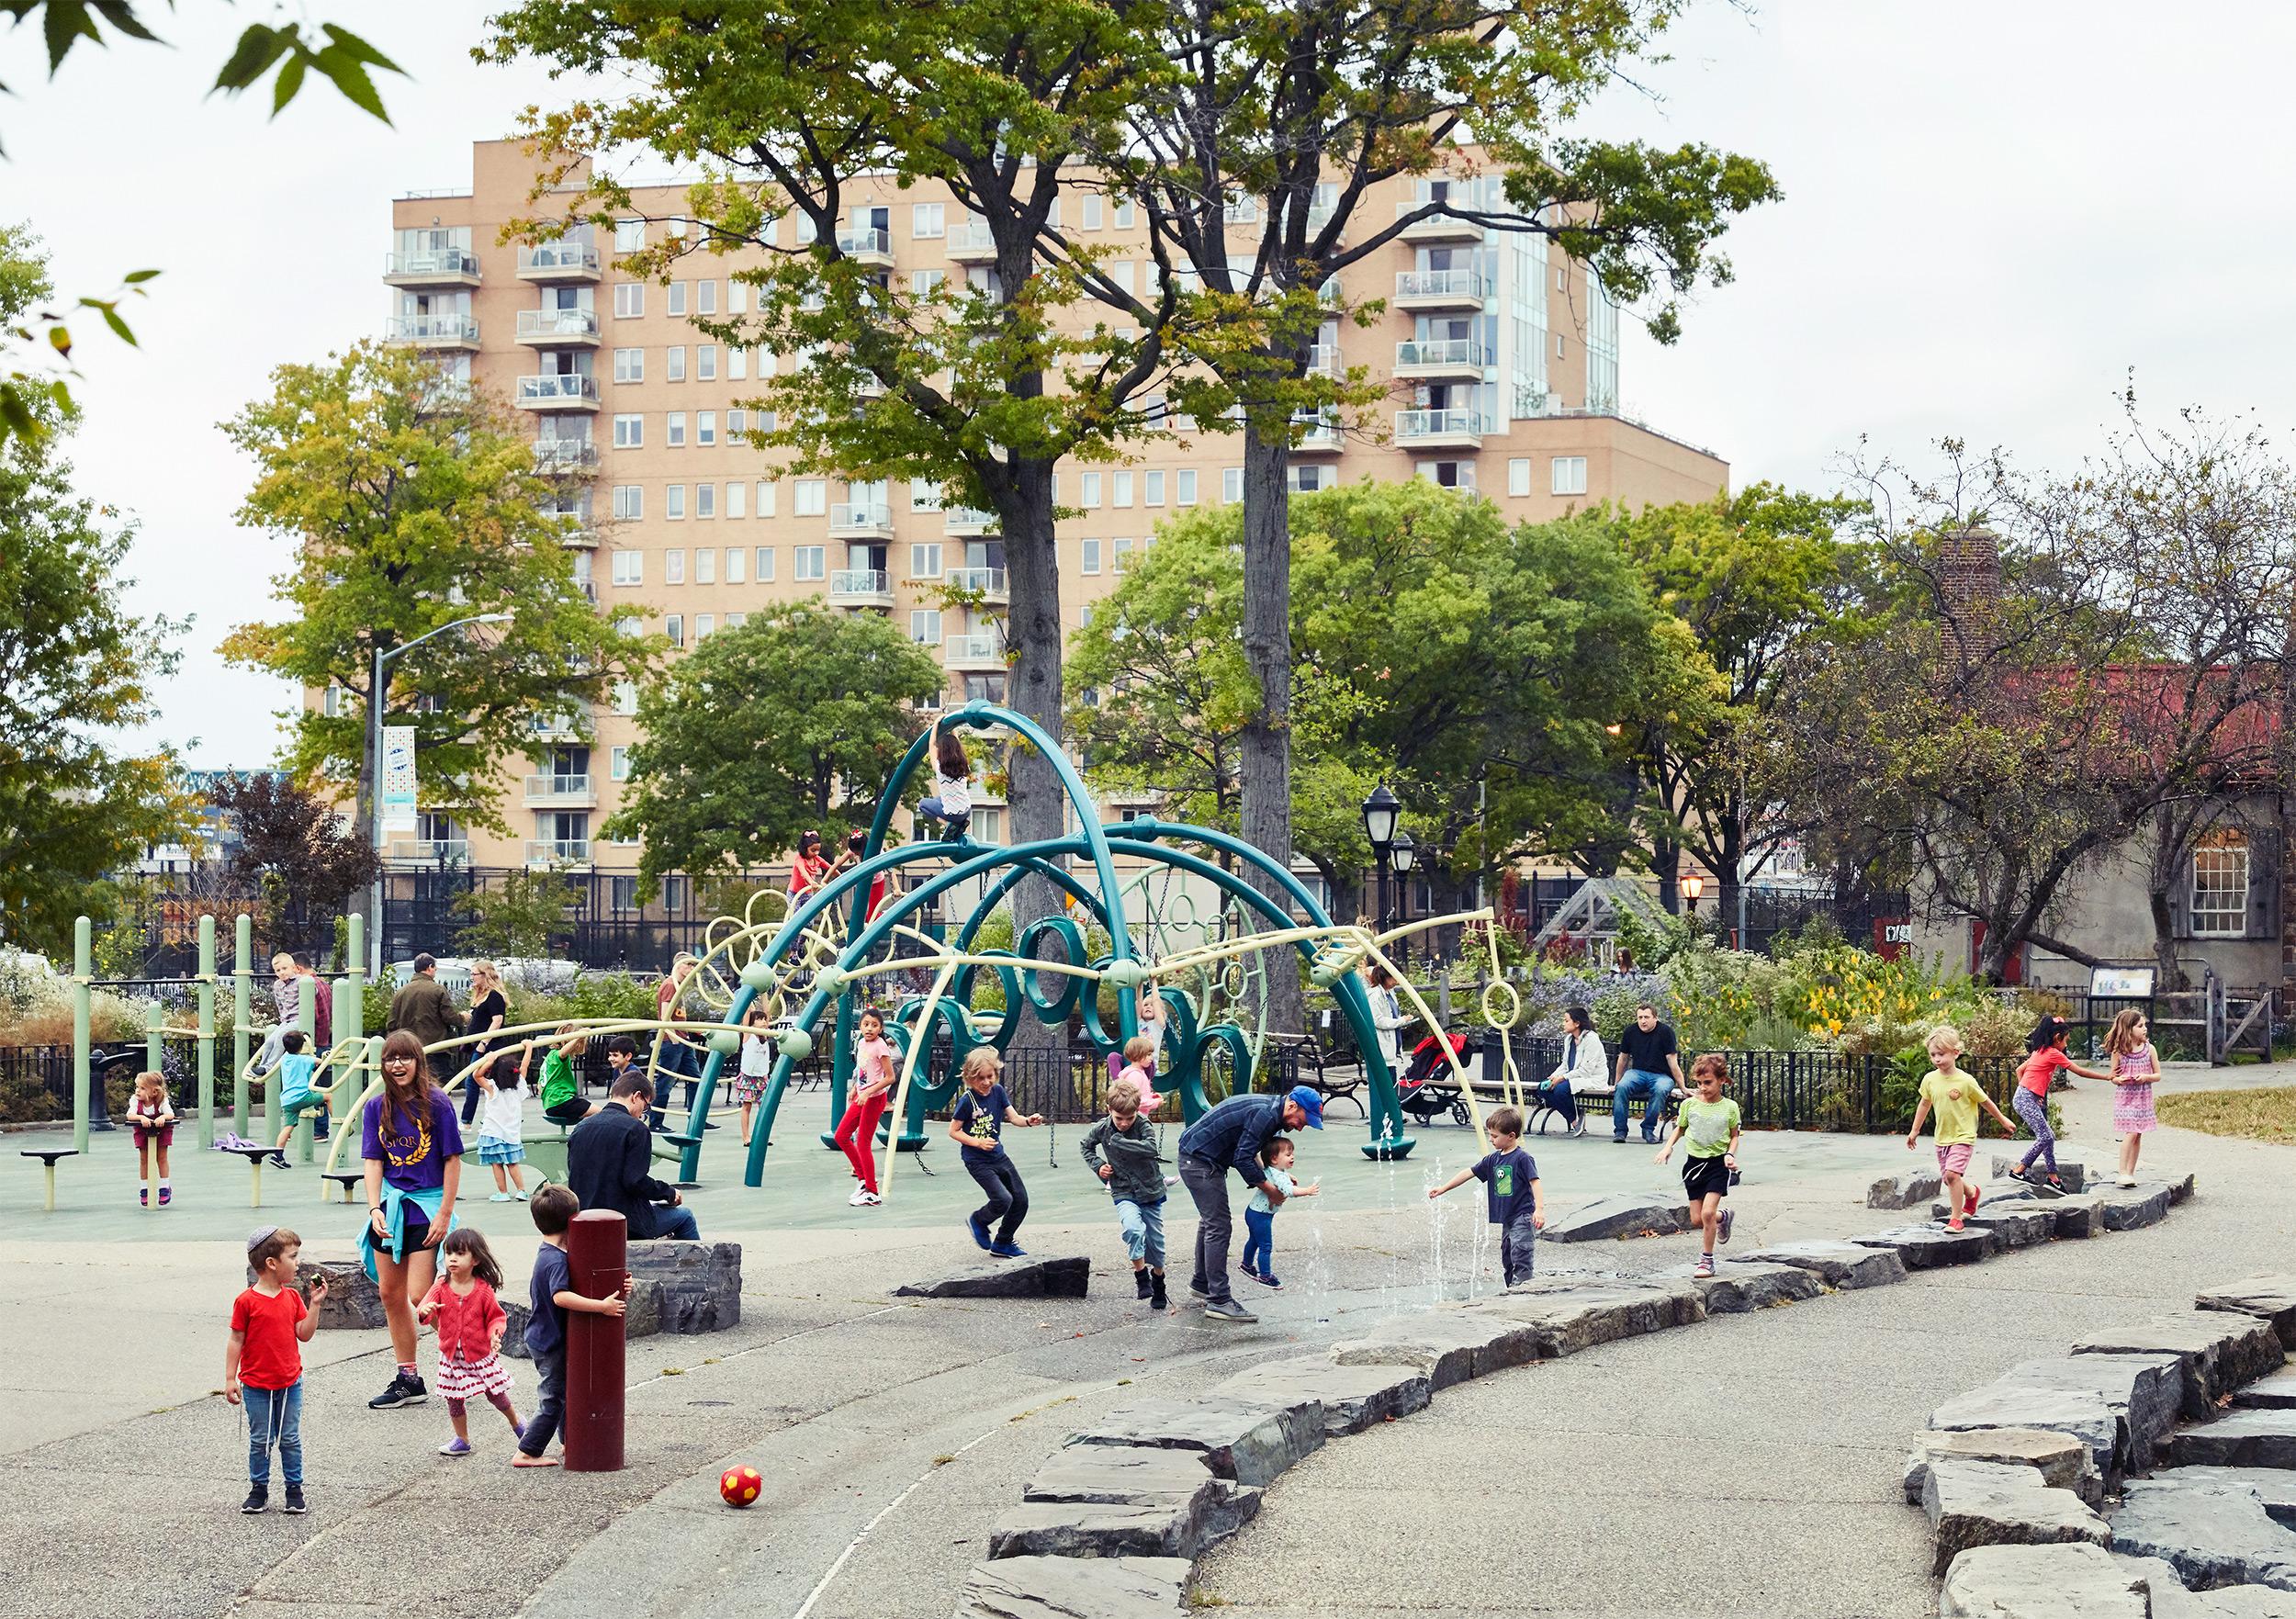 Playground-3.0-FinalRetouch.jpg